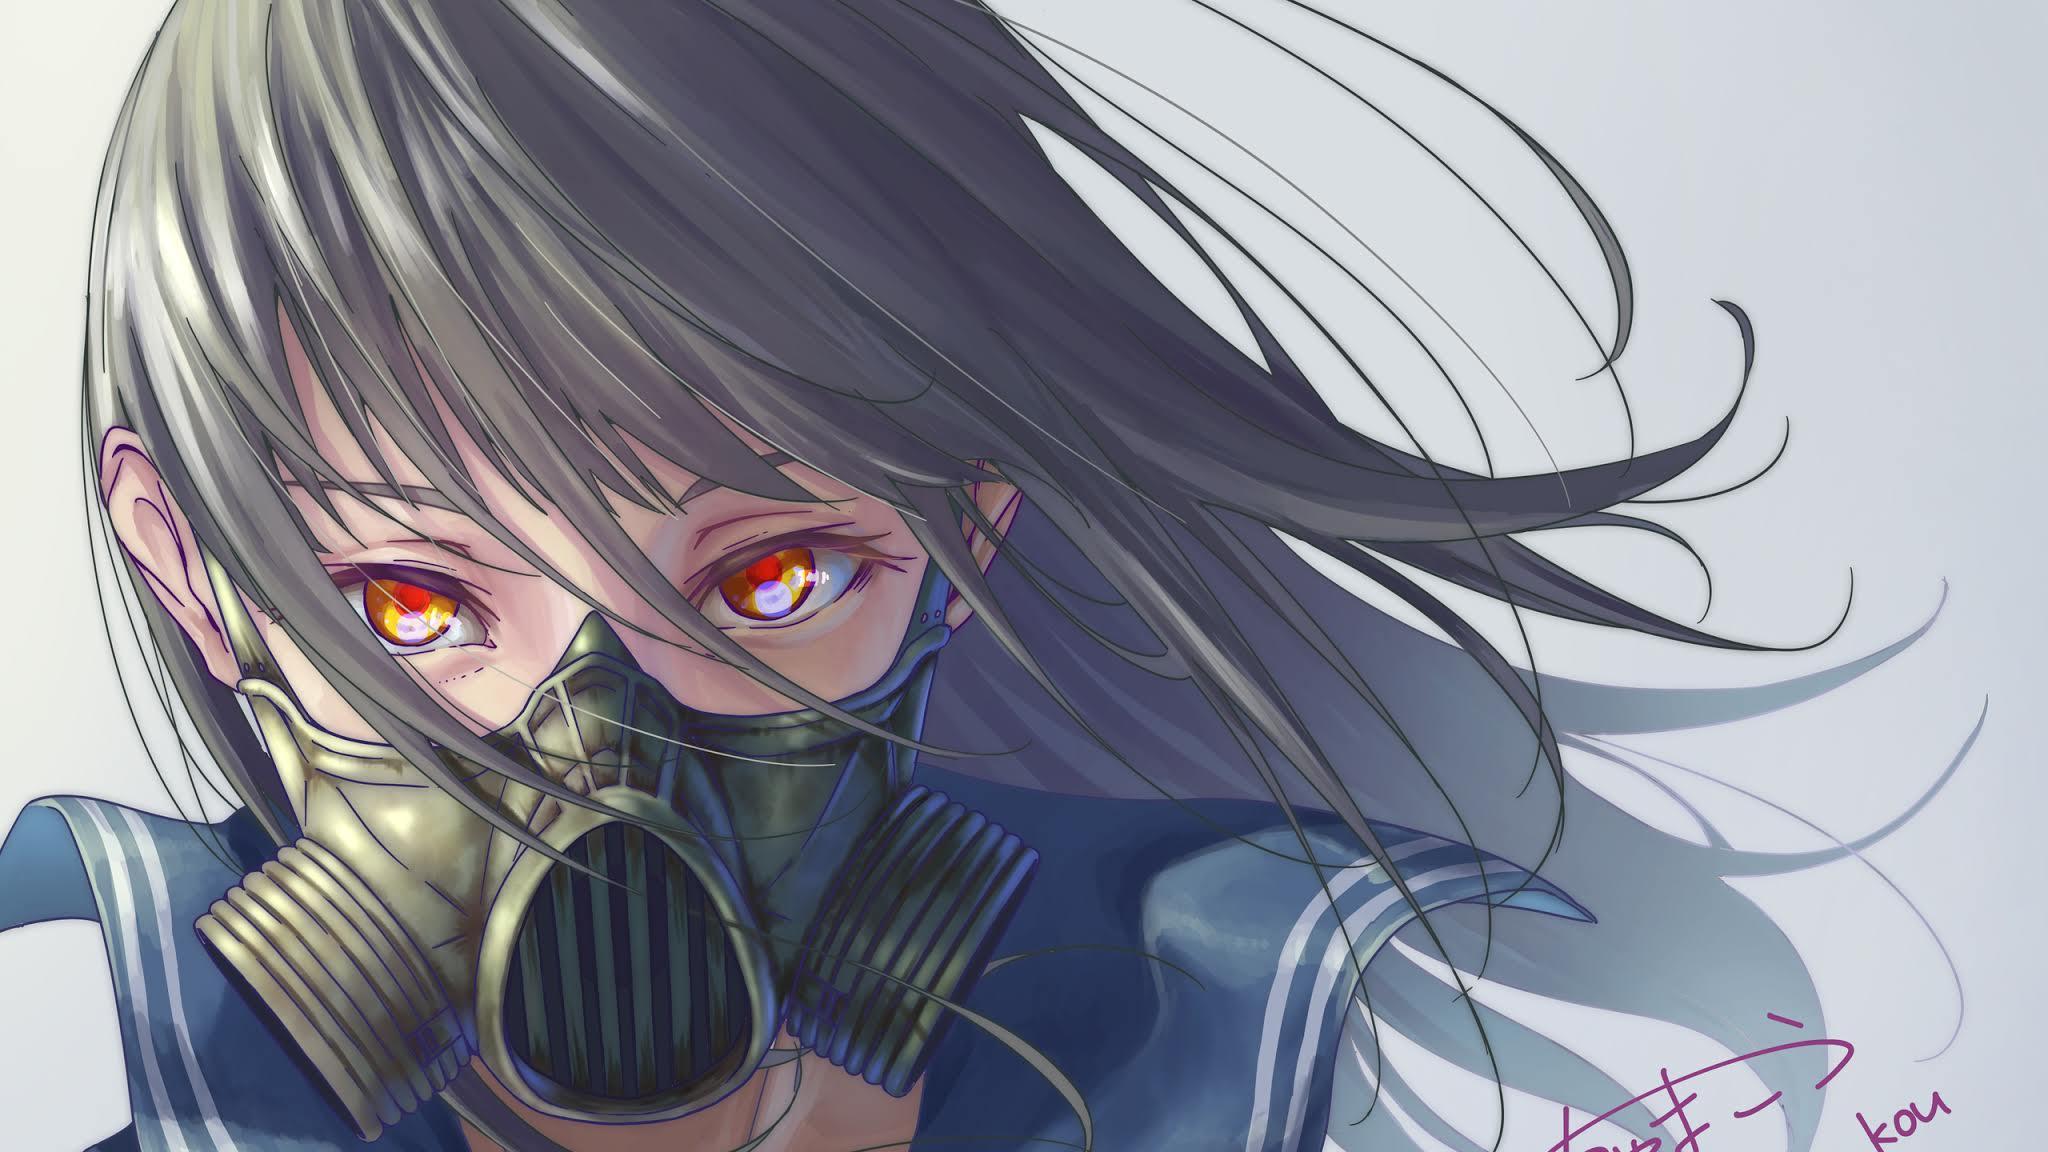 Mask Anime Girl Wallpapers - Wallpaper Cave